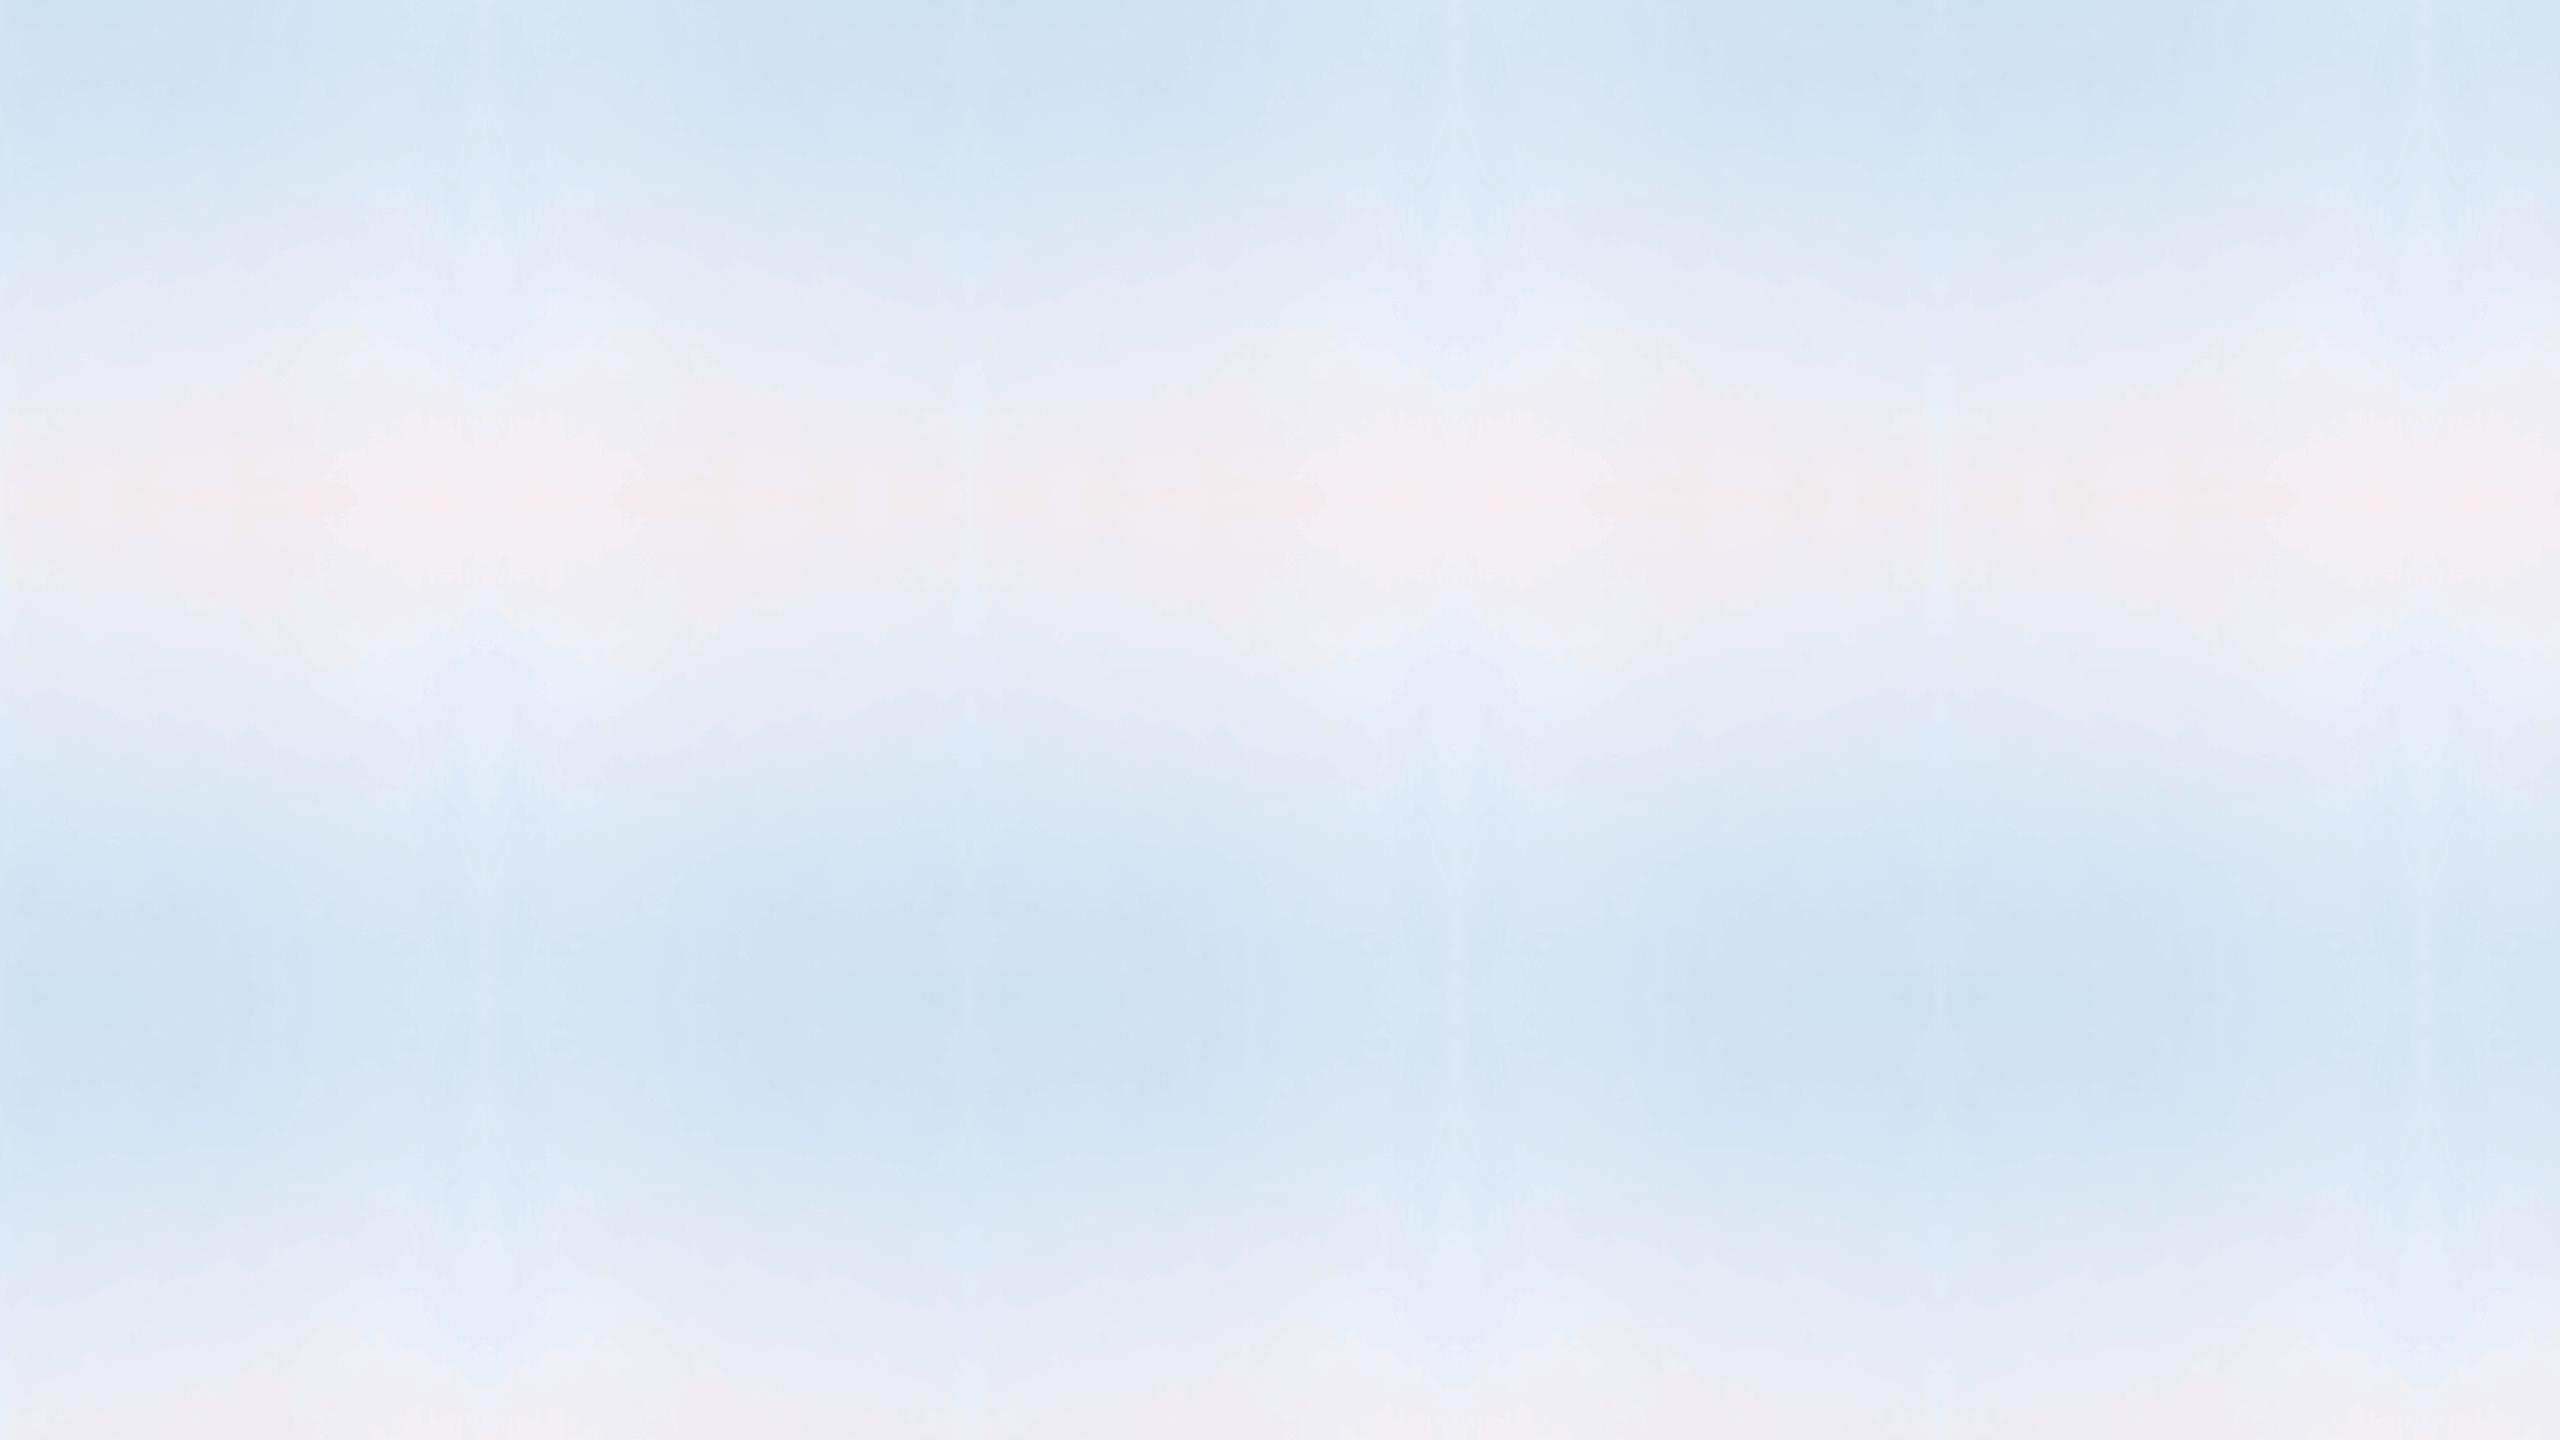 Light Blue Pastel Wallpaper Tosmun